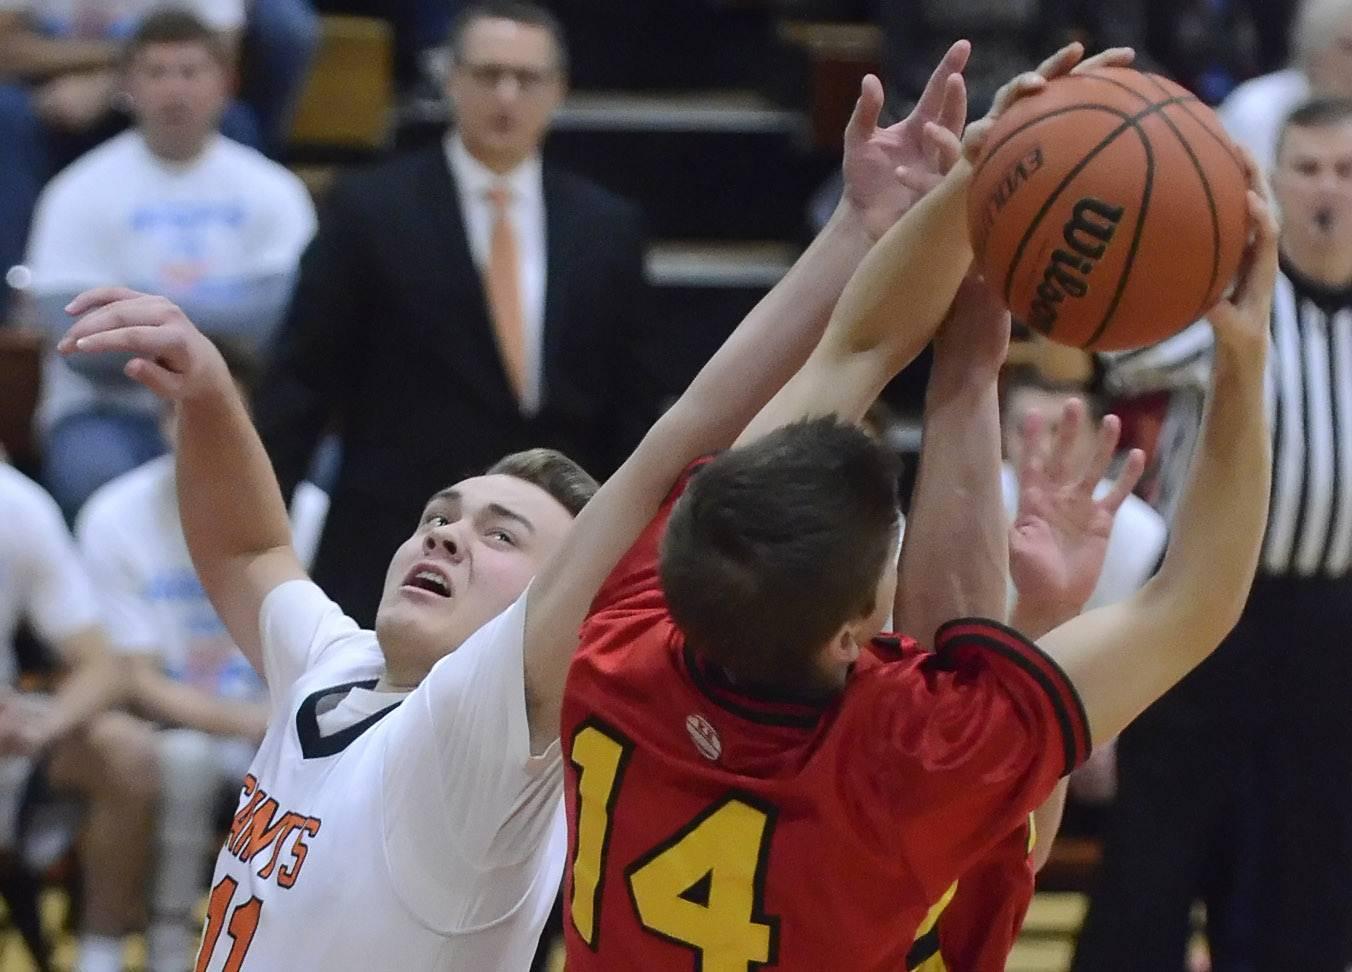 Images: St. Charles East vs. Batavia, boys basketball